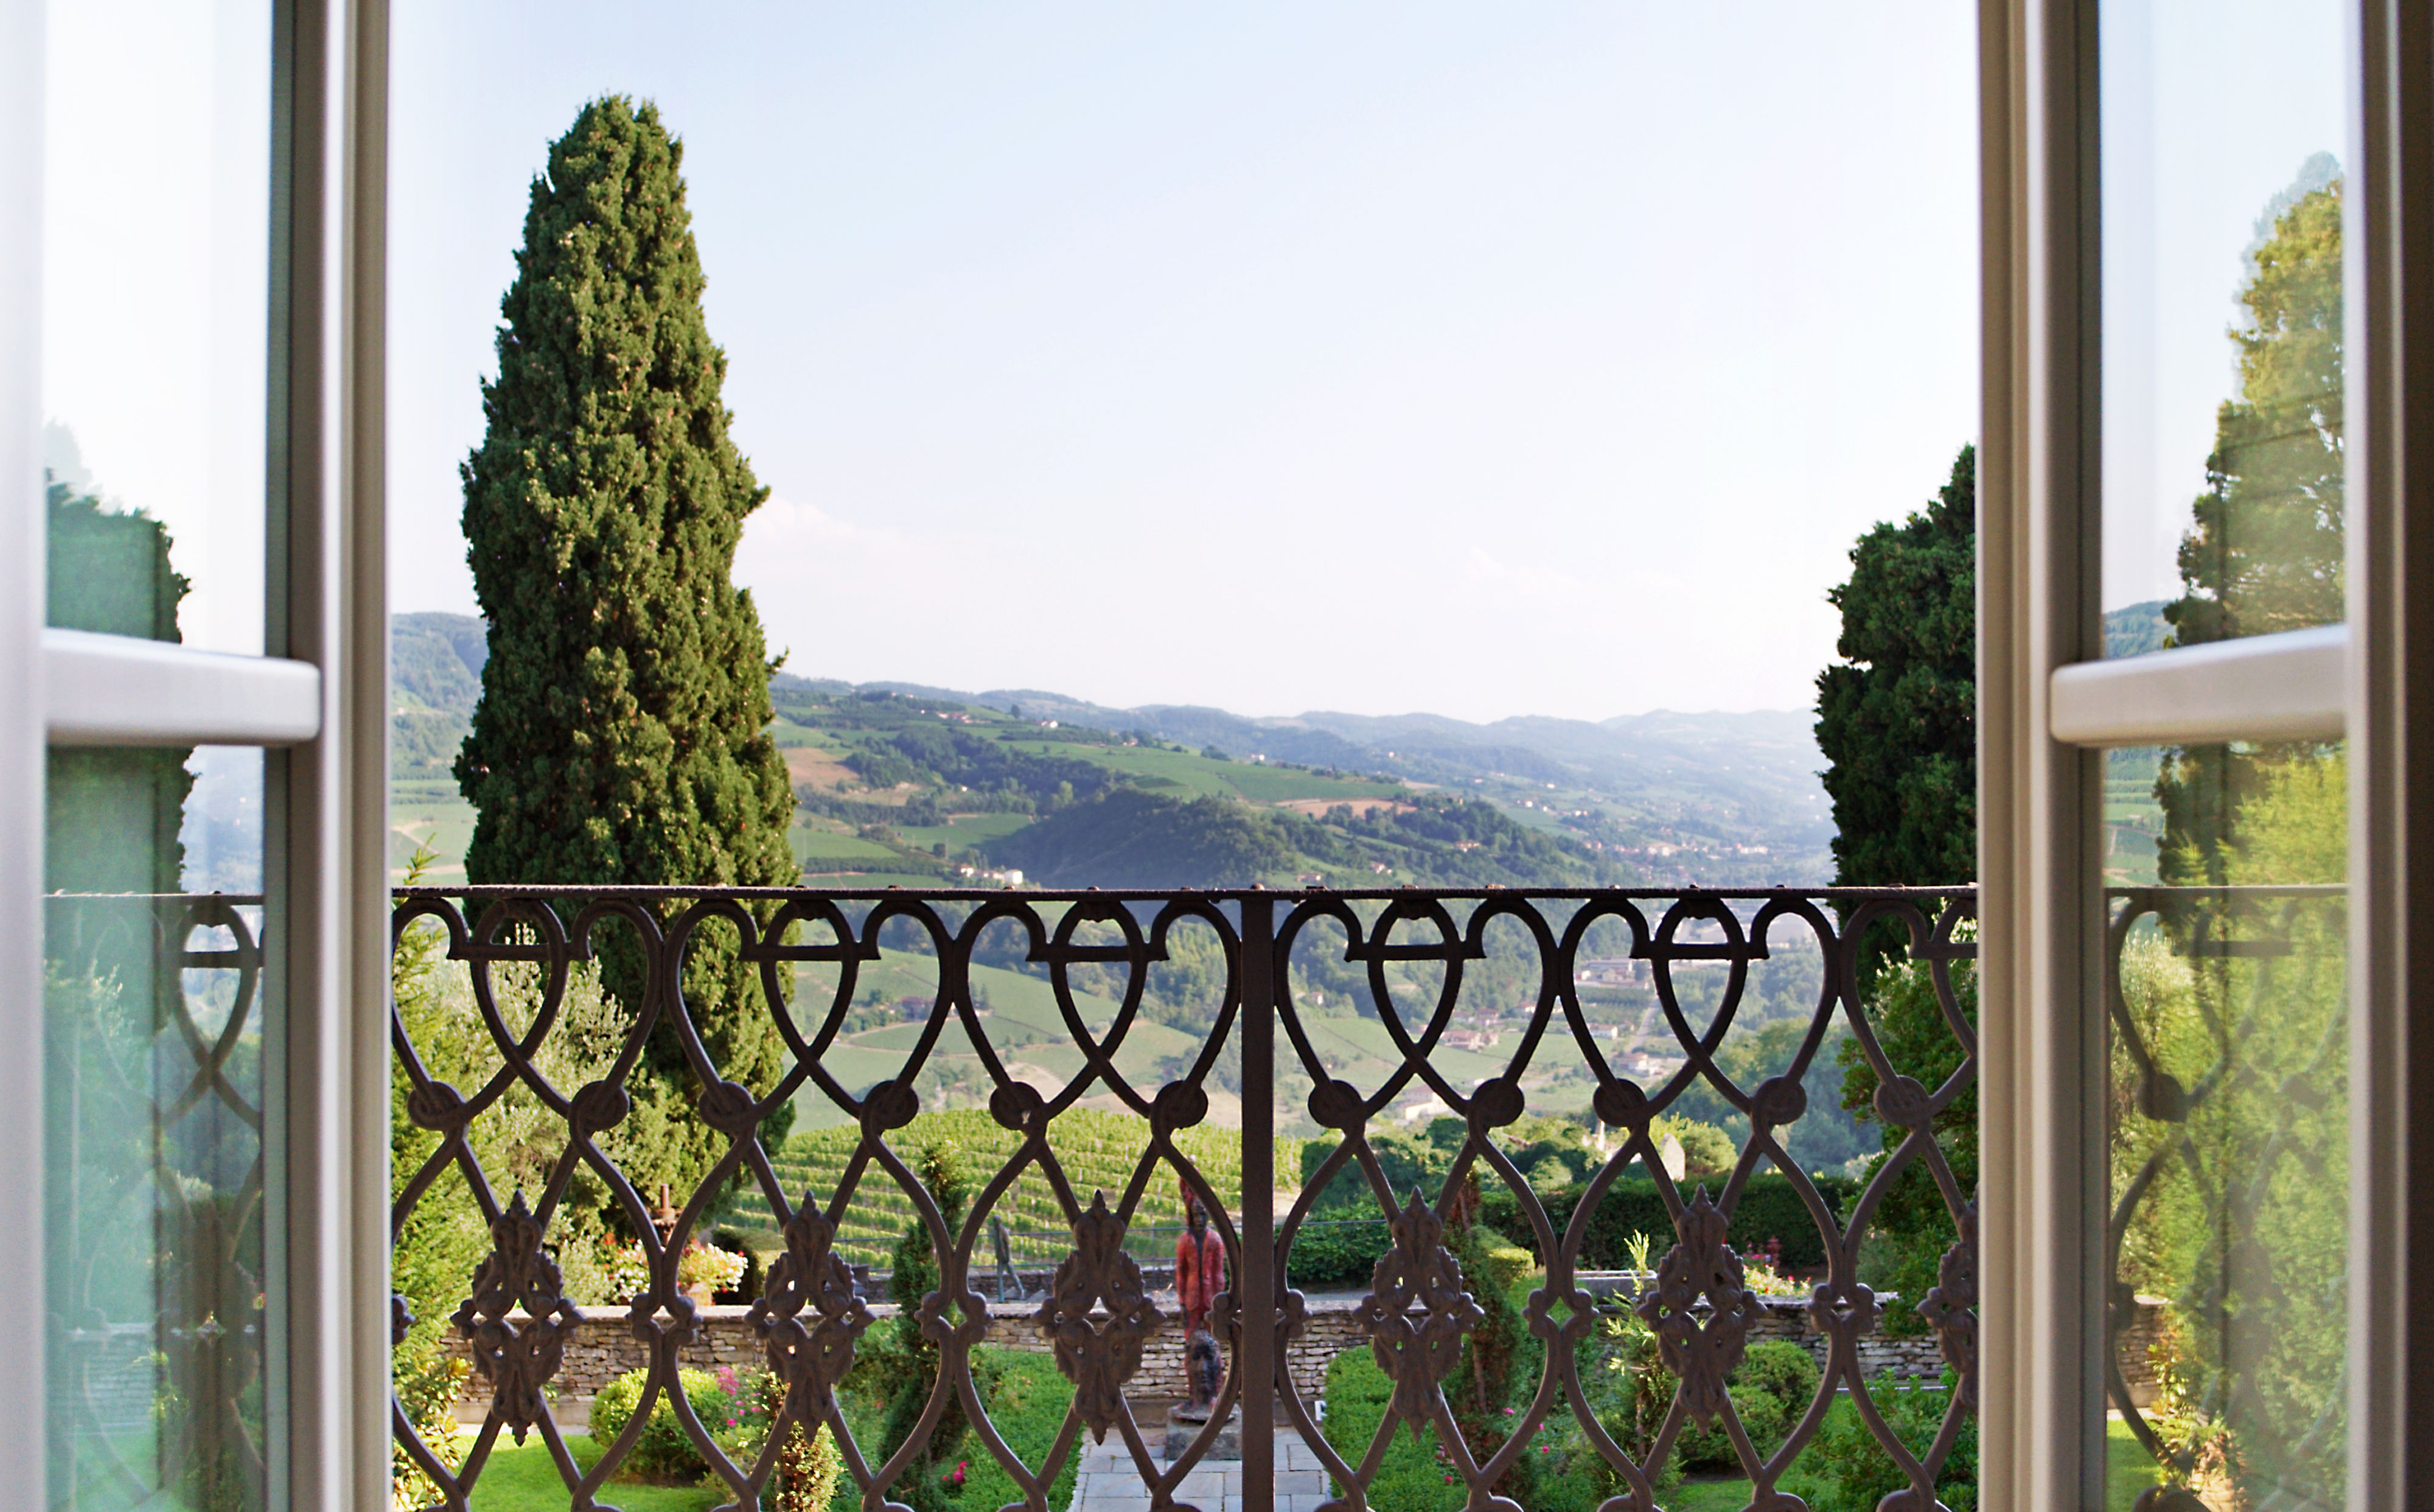 #WineResort, tappa tra i vini piemontesi più esclusivi